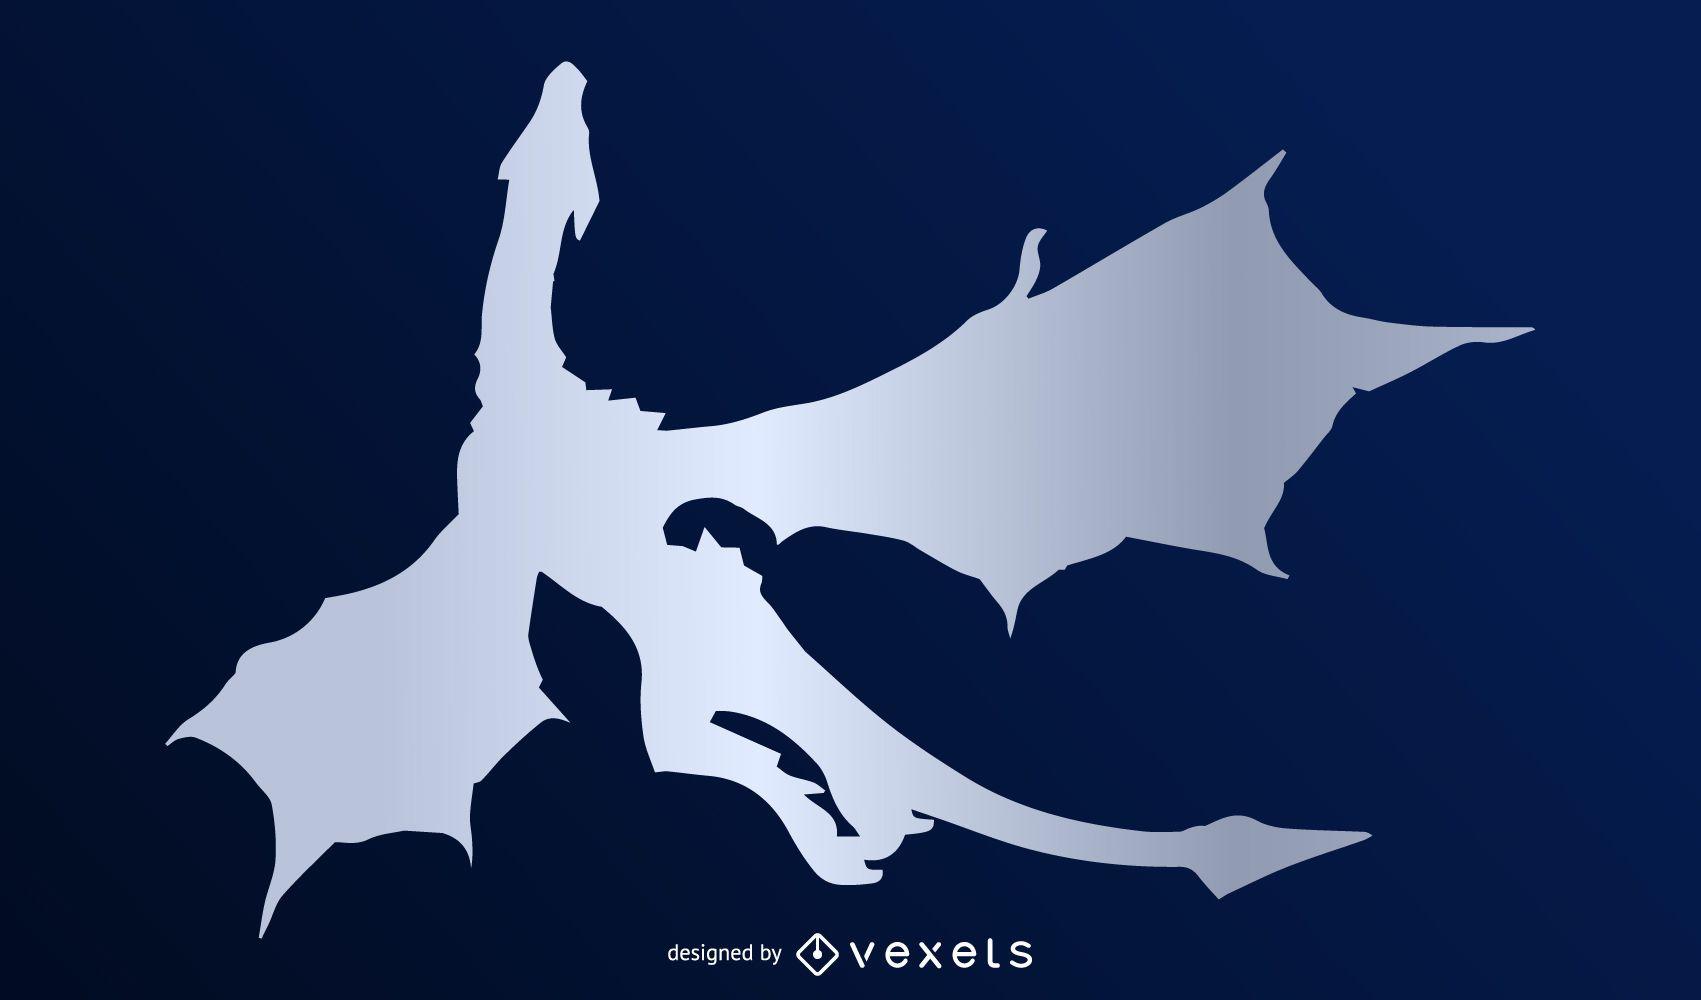 Vector de silueta de dragón plateado